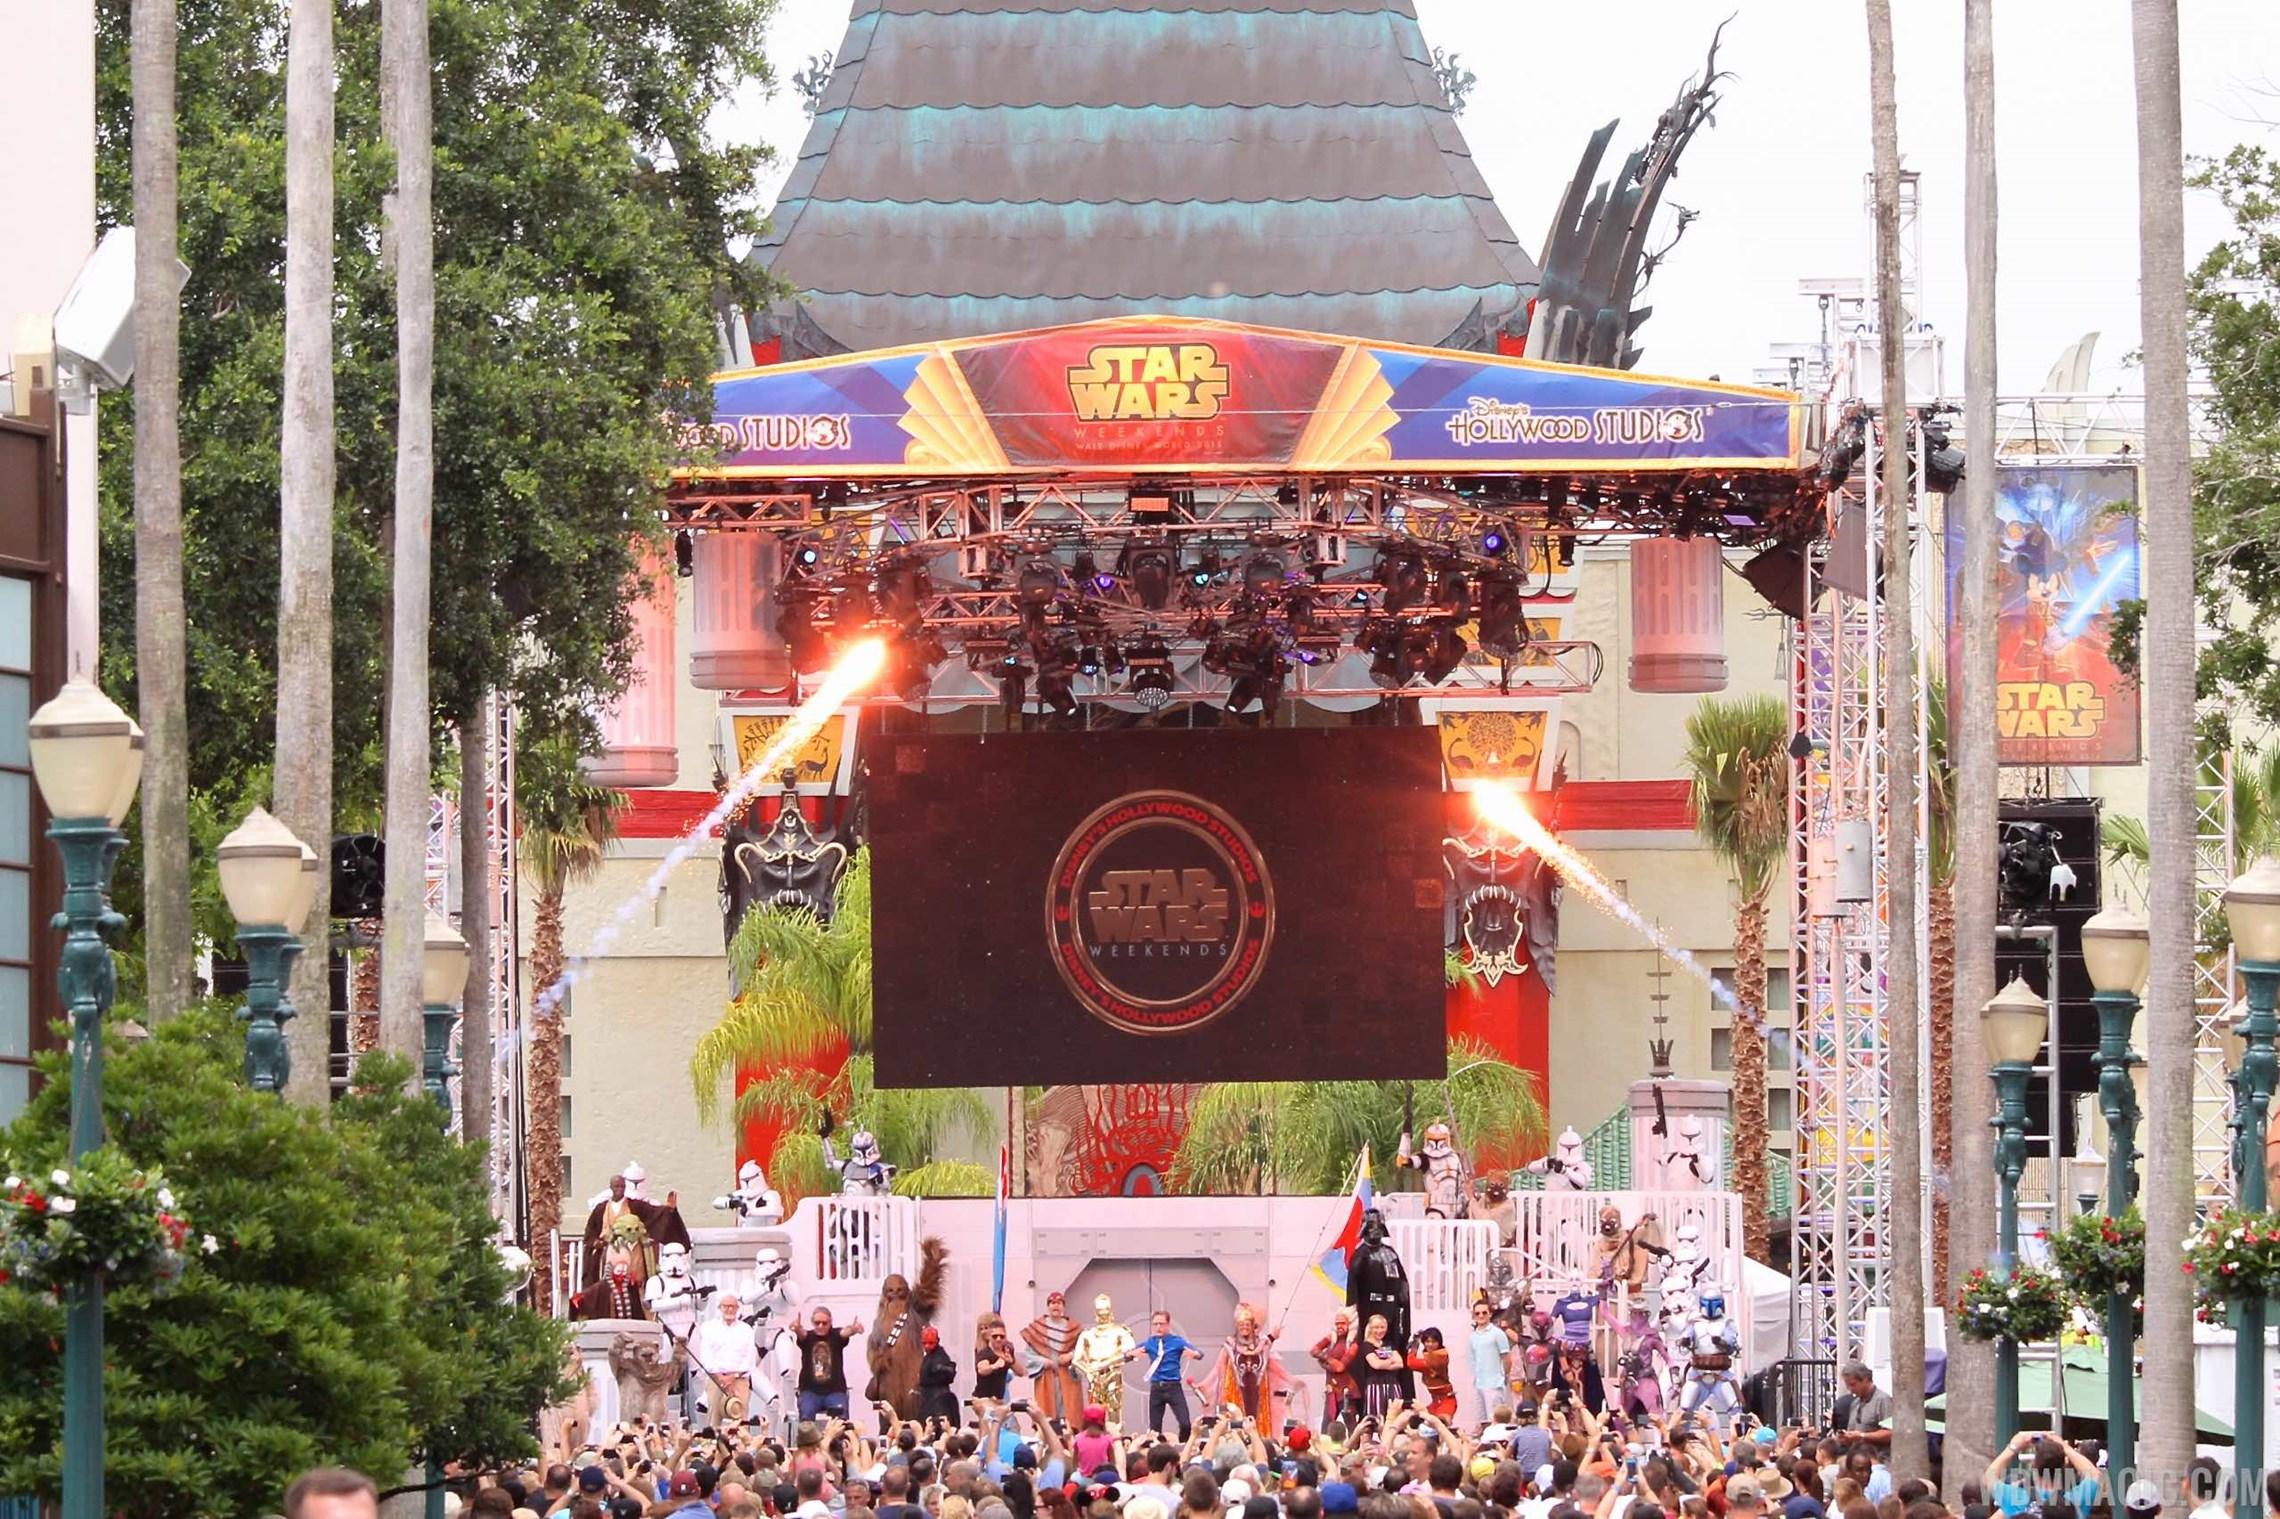 2015 Star Wars Weekends - Weekend 5 Legends of the Force motorcade celebrities